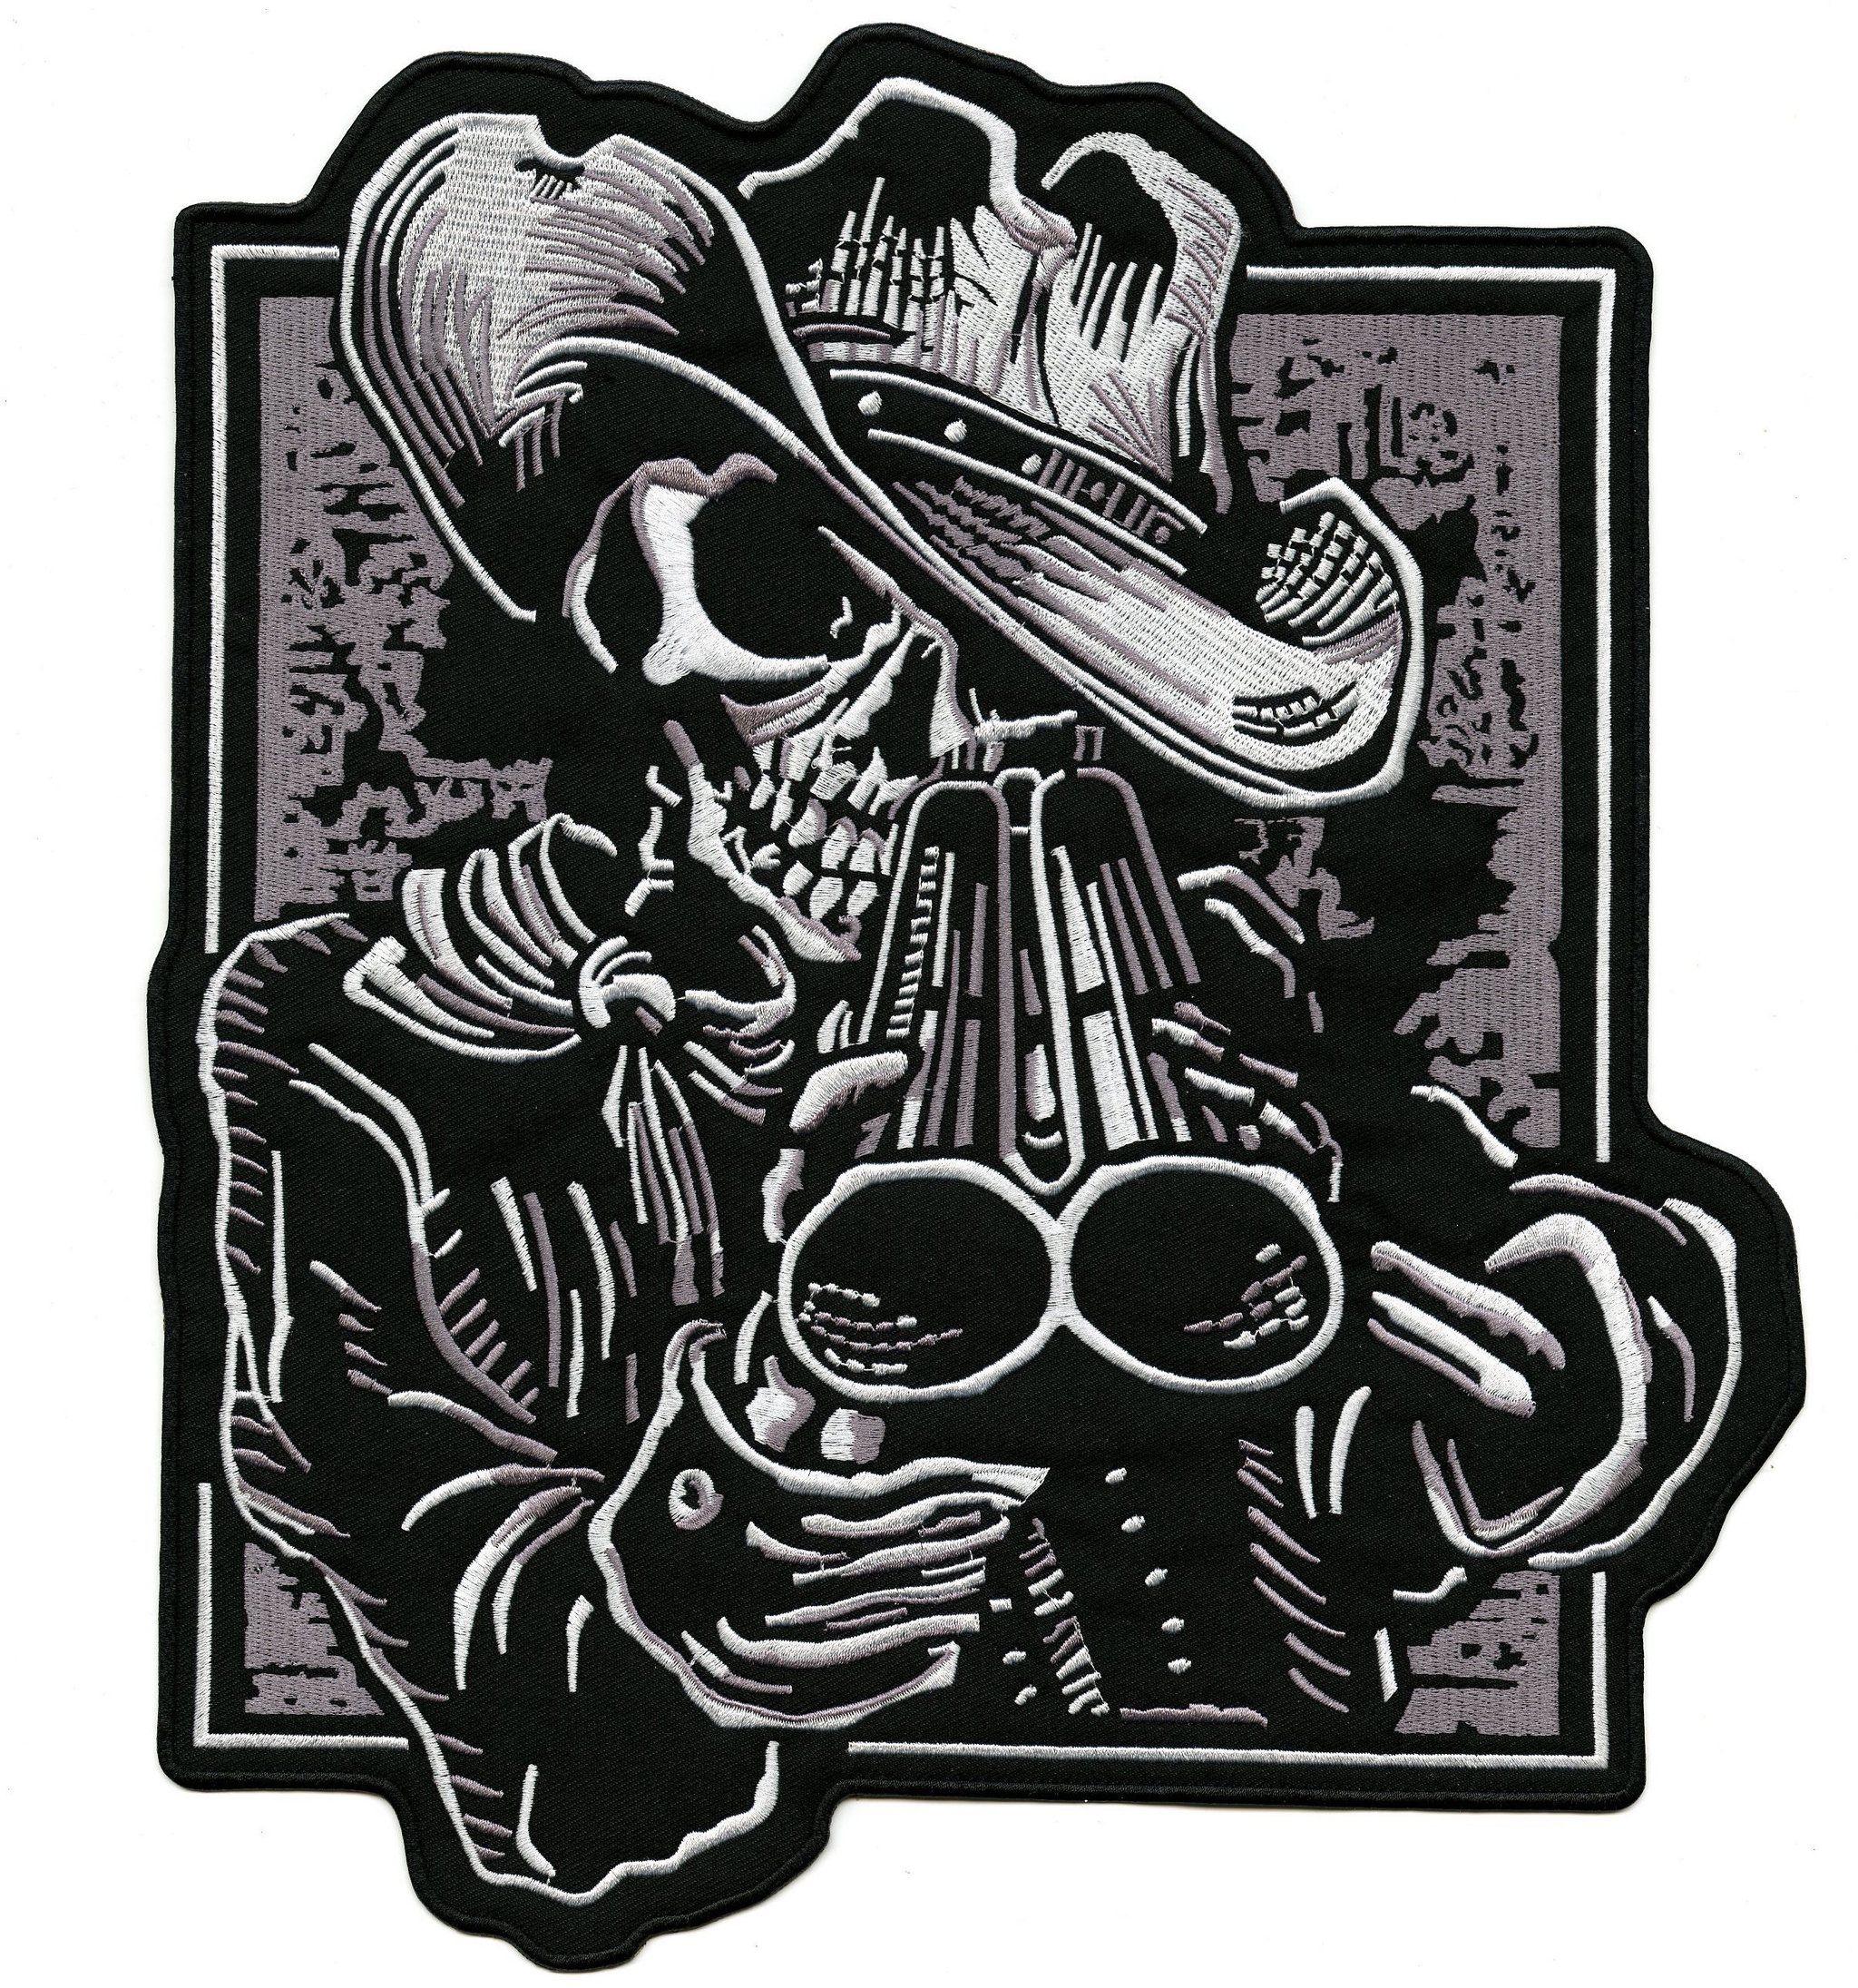 60b47786d4c Double Barrel Shotgun Skeleton Large Embroidered Patch Bandito ...